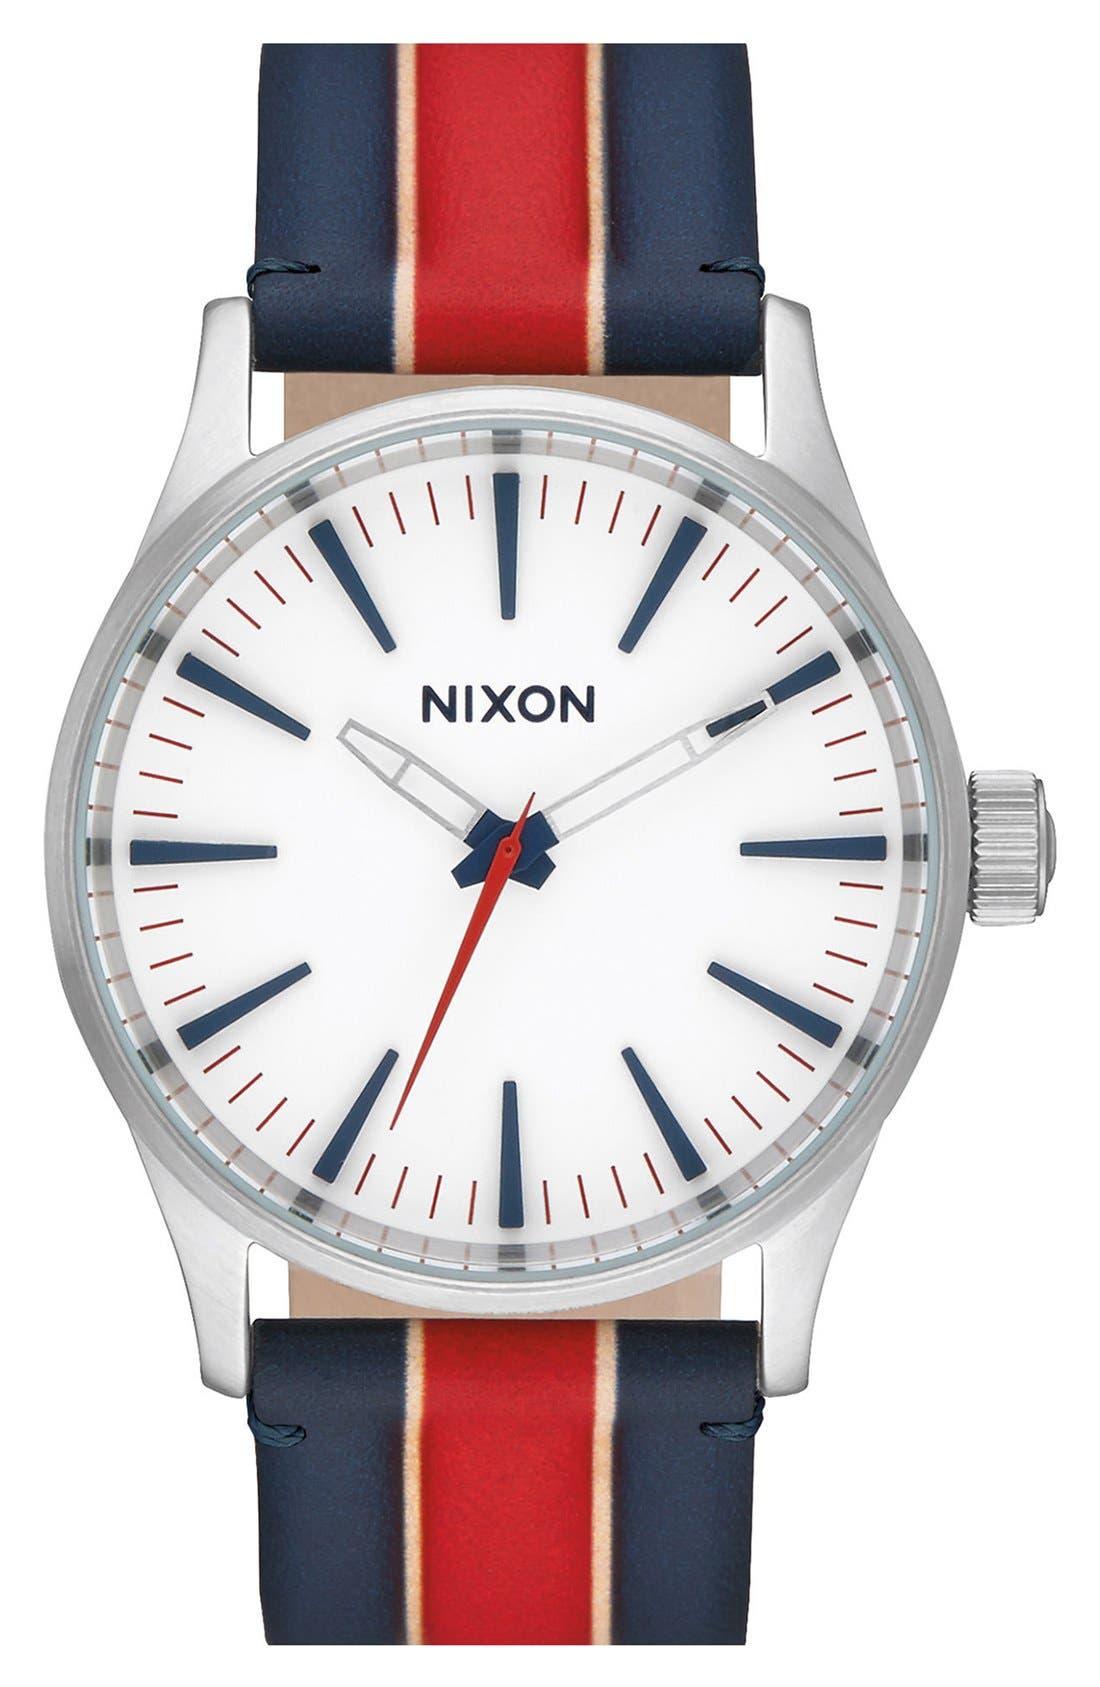 NIXON Sentry Stripe Canvas Strap Watch, 38mm